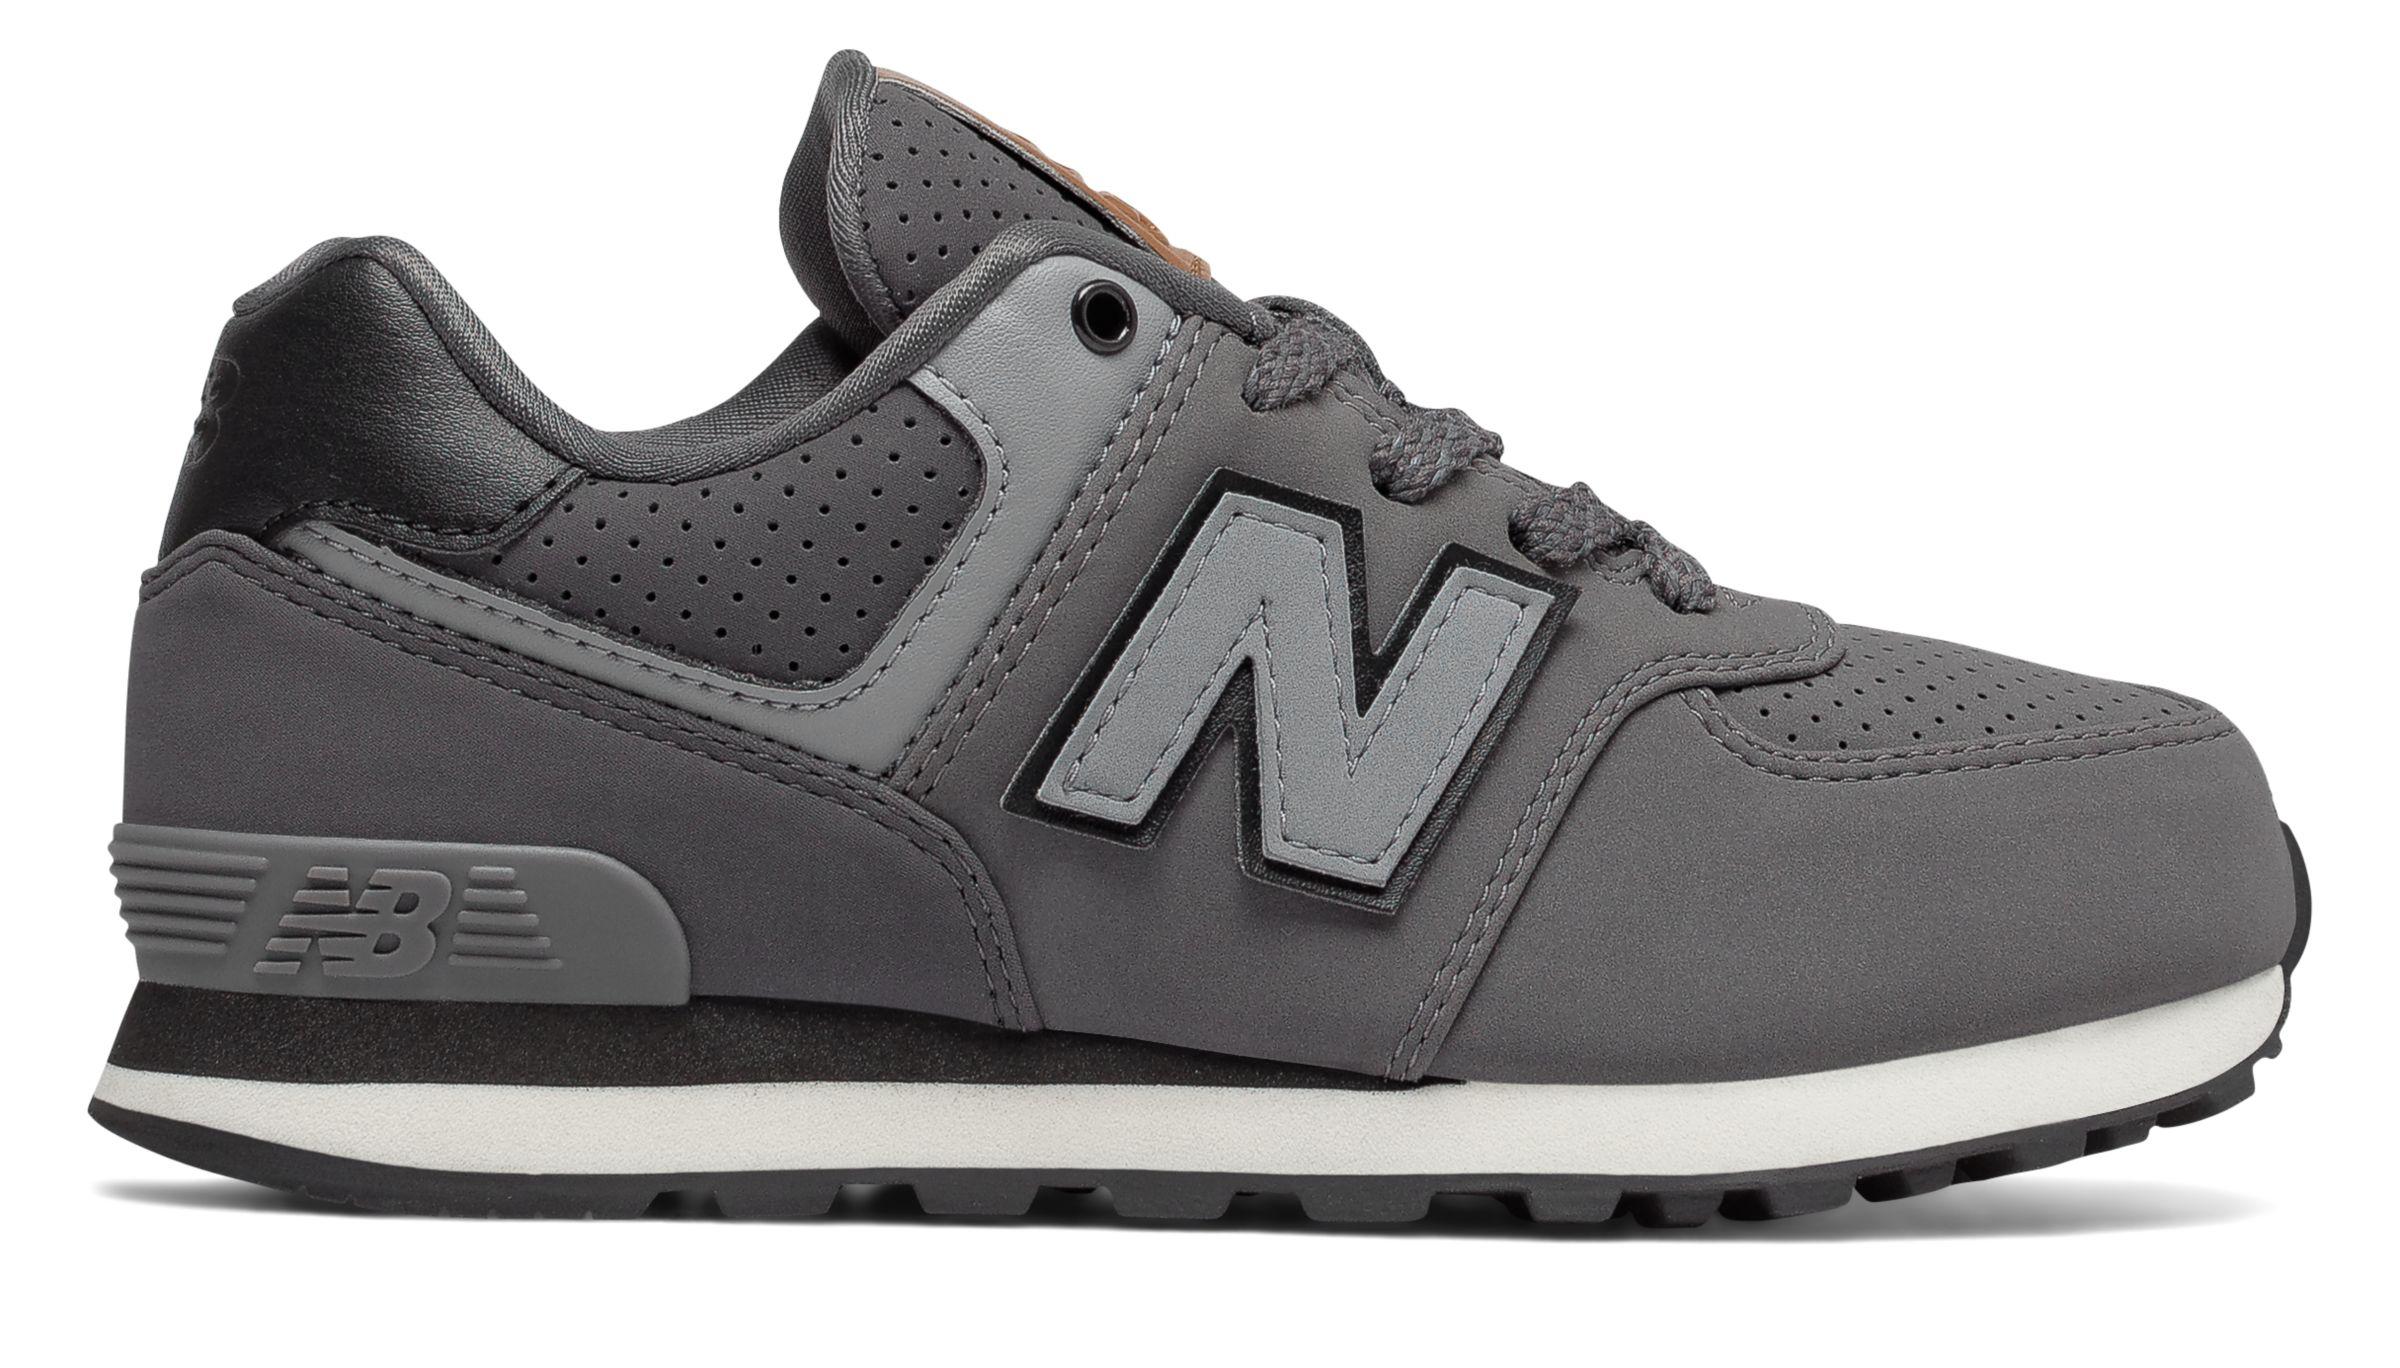 NB 574 New Balance, Grey with Black